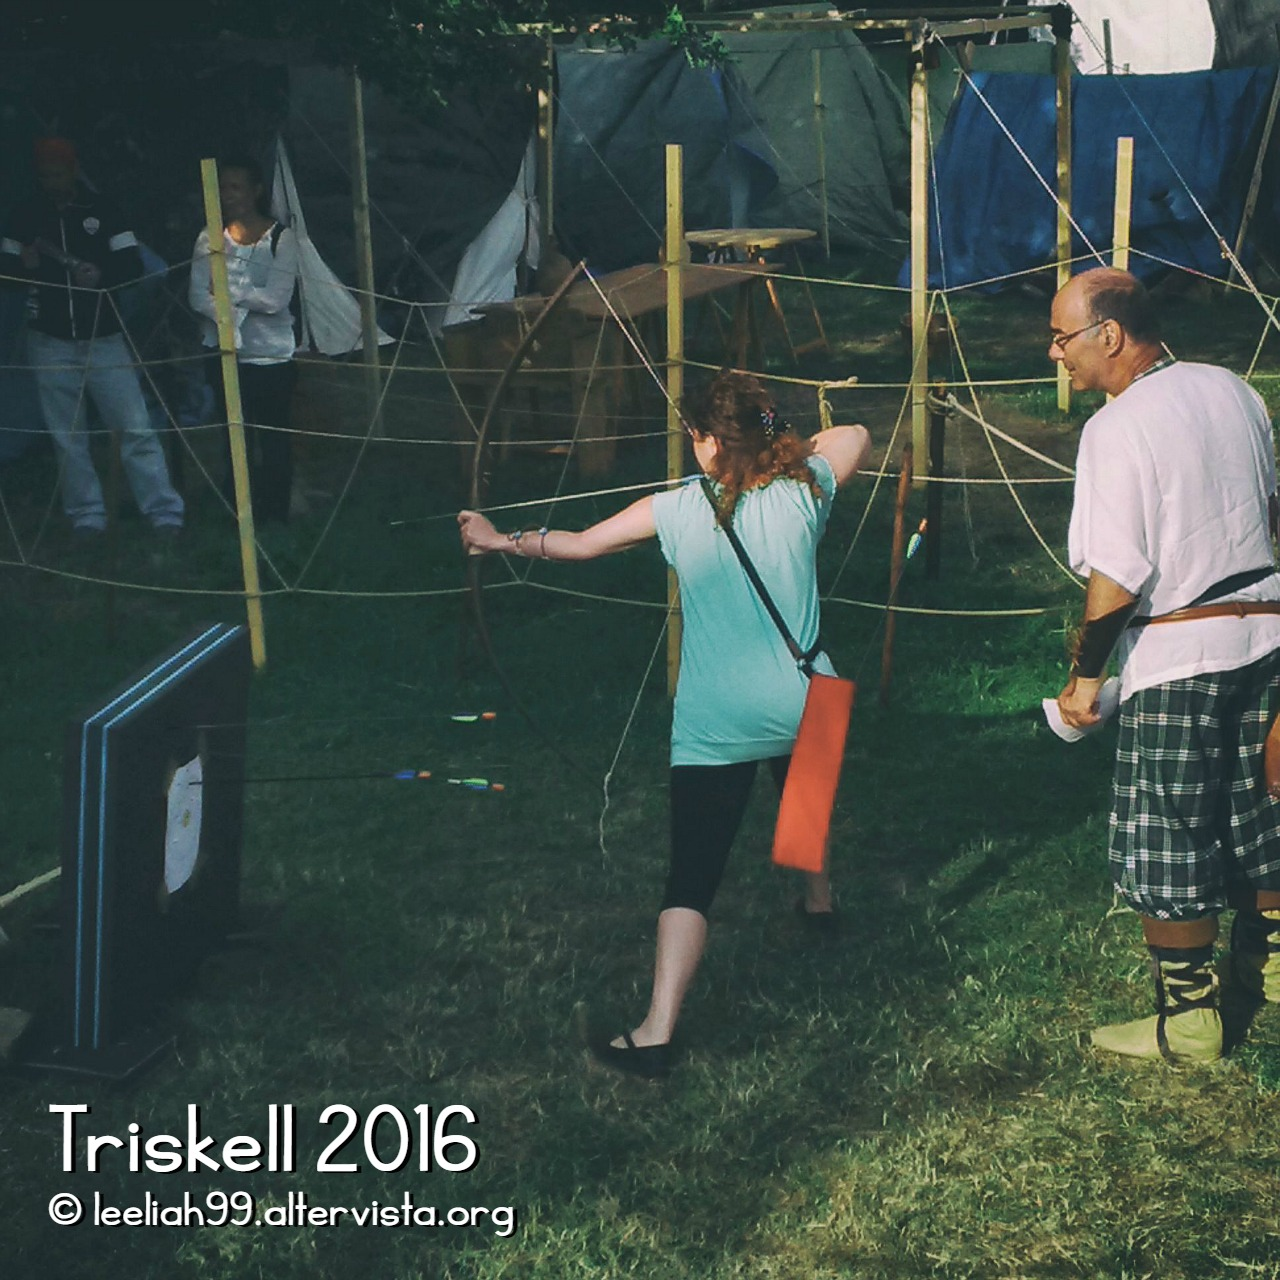 Triskell 2016 © leeliah99.altervista.org